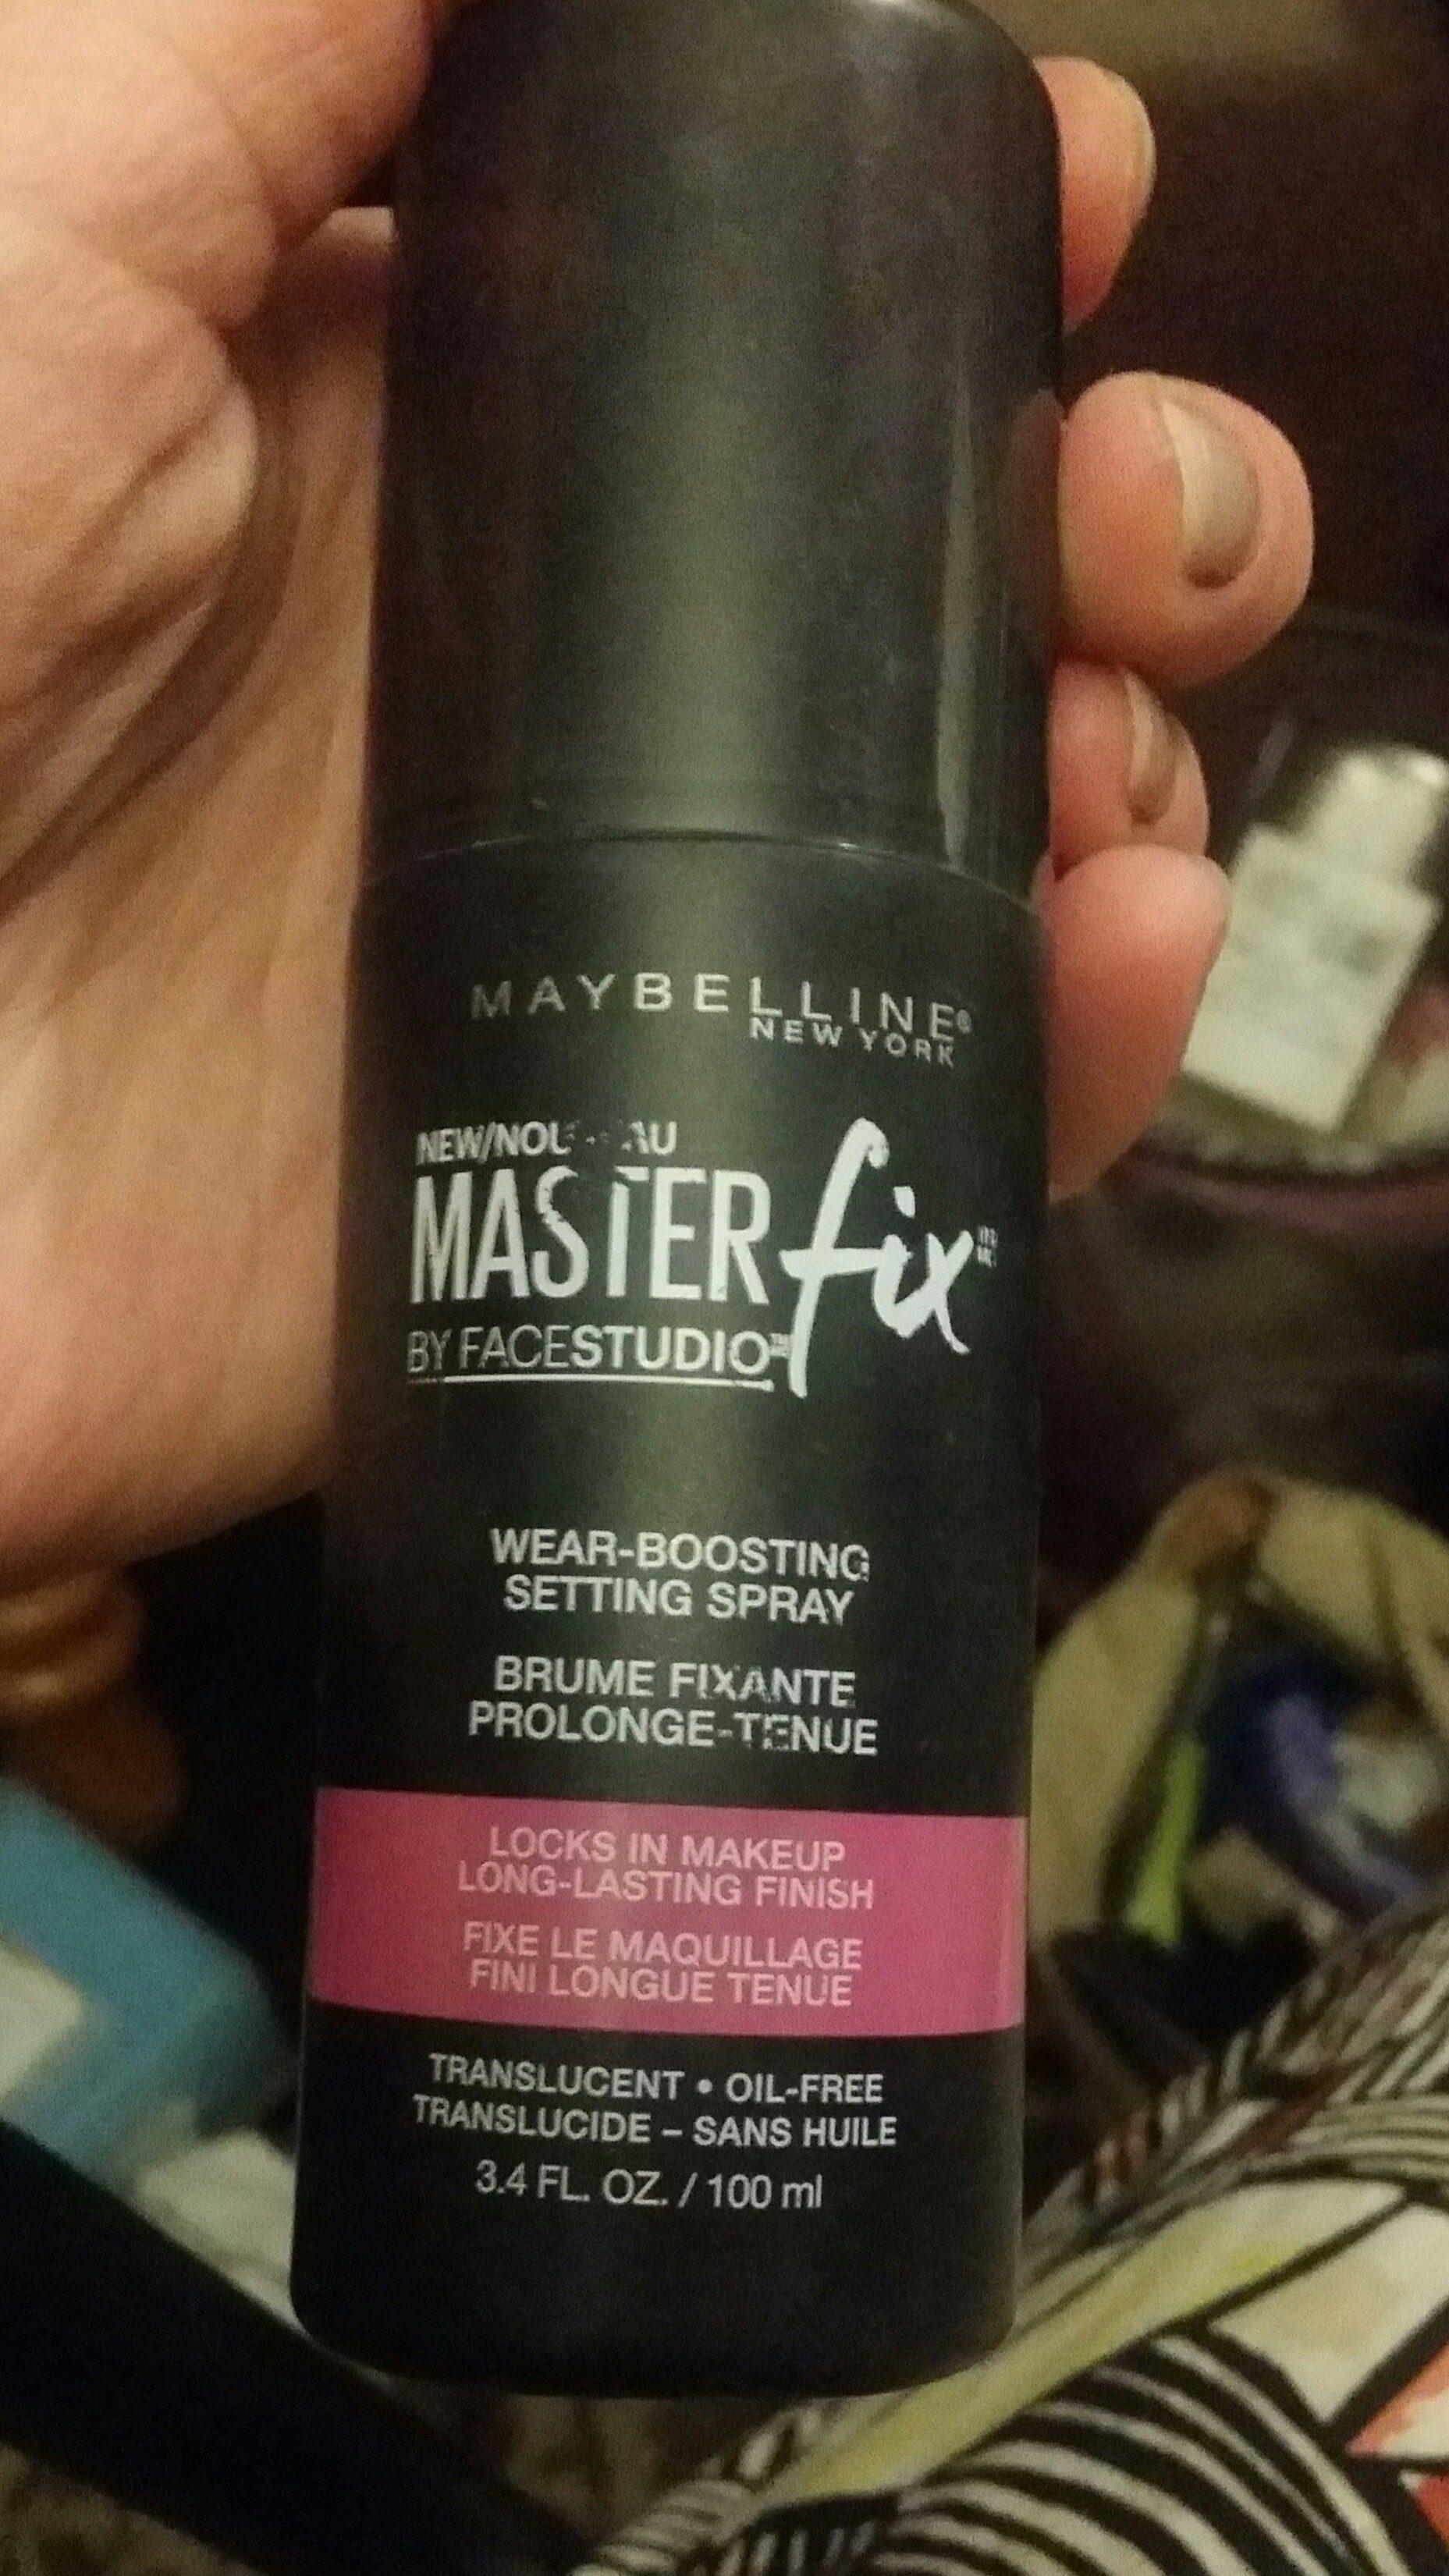 Master fix by face studios - Product - en